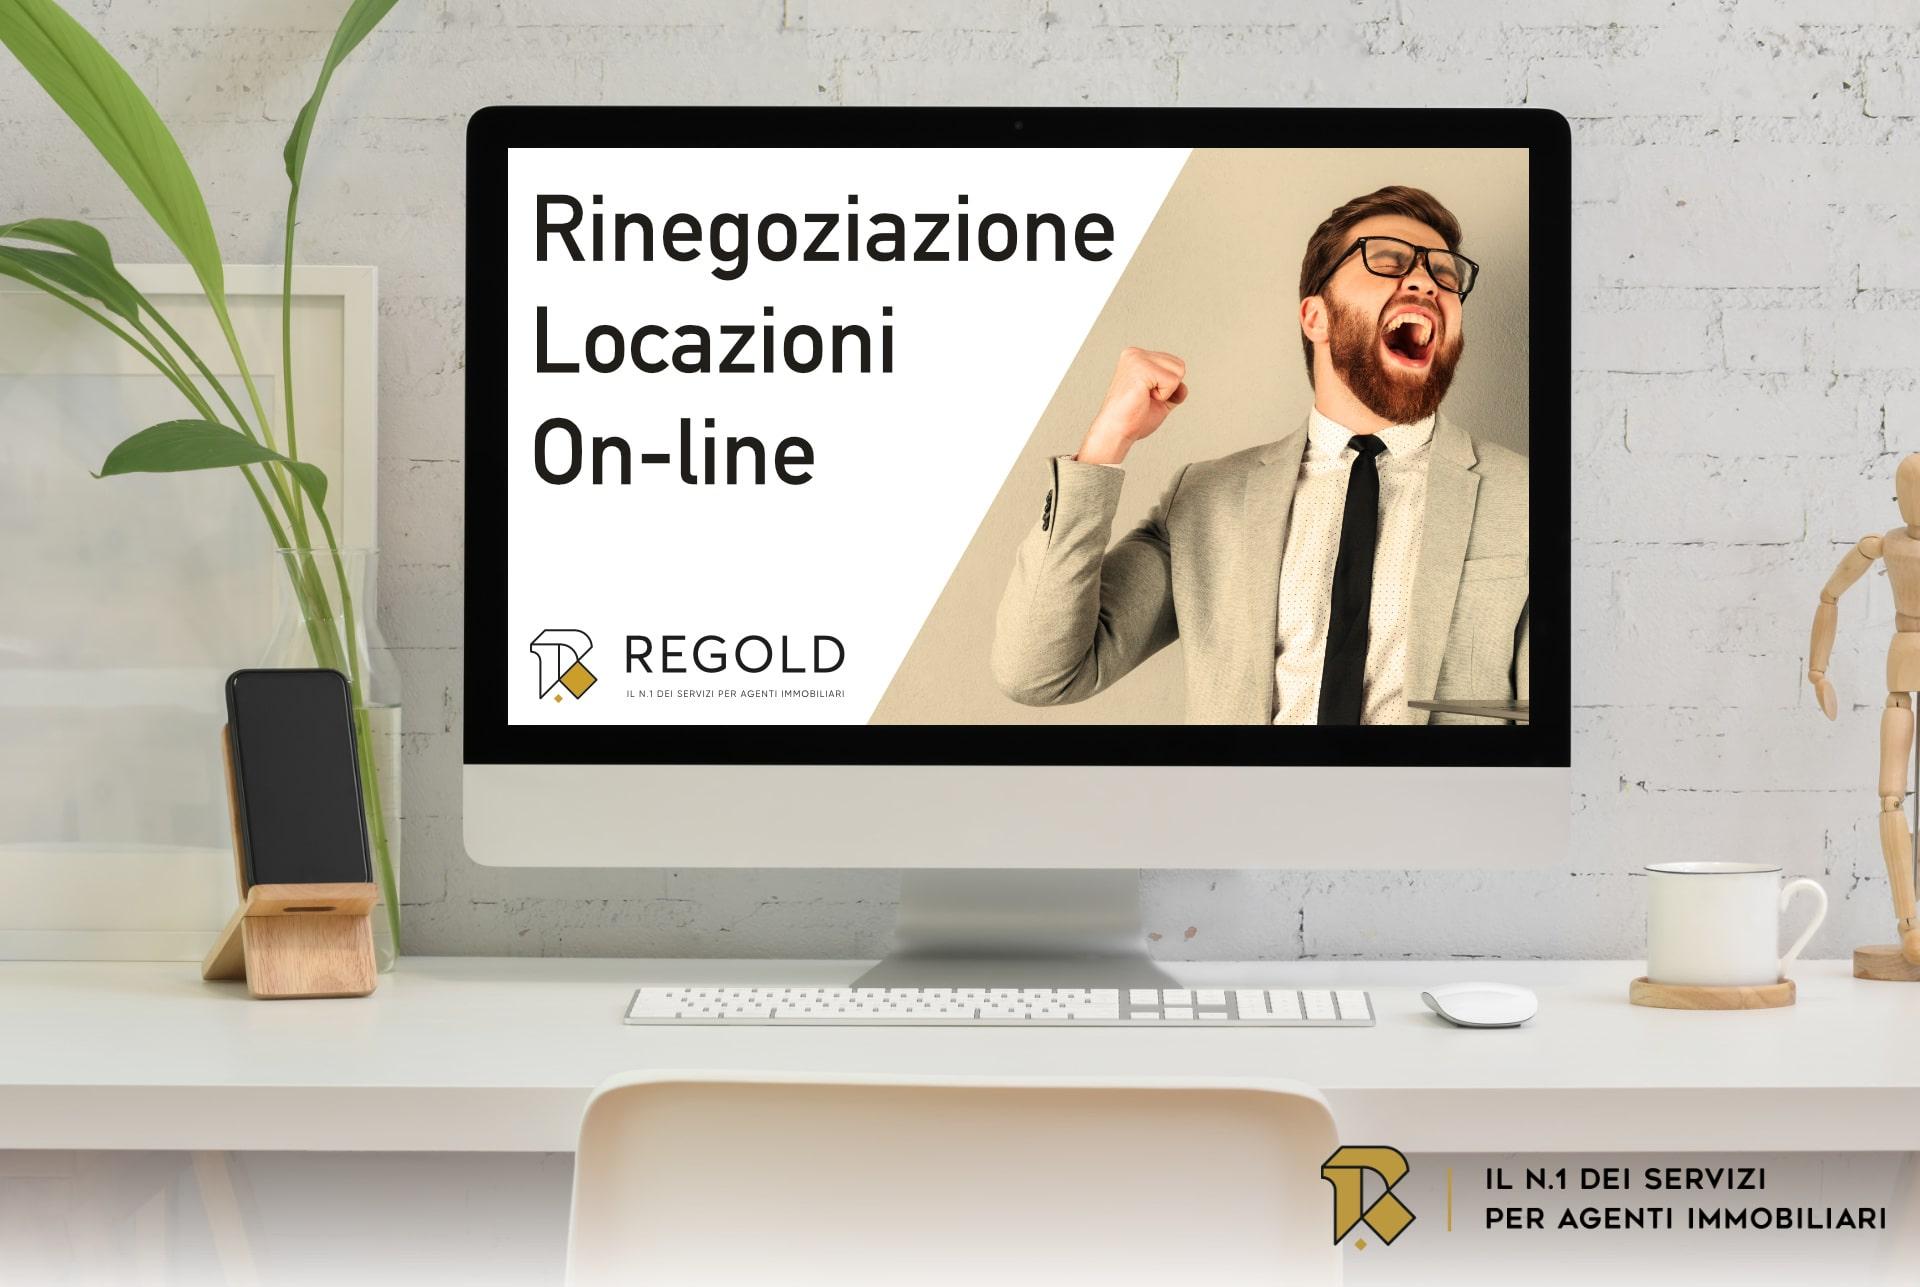 Rinegoziazione locazioni online RLI